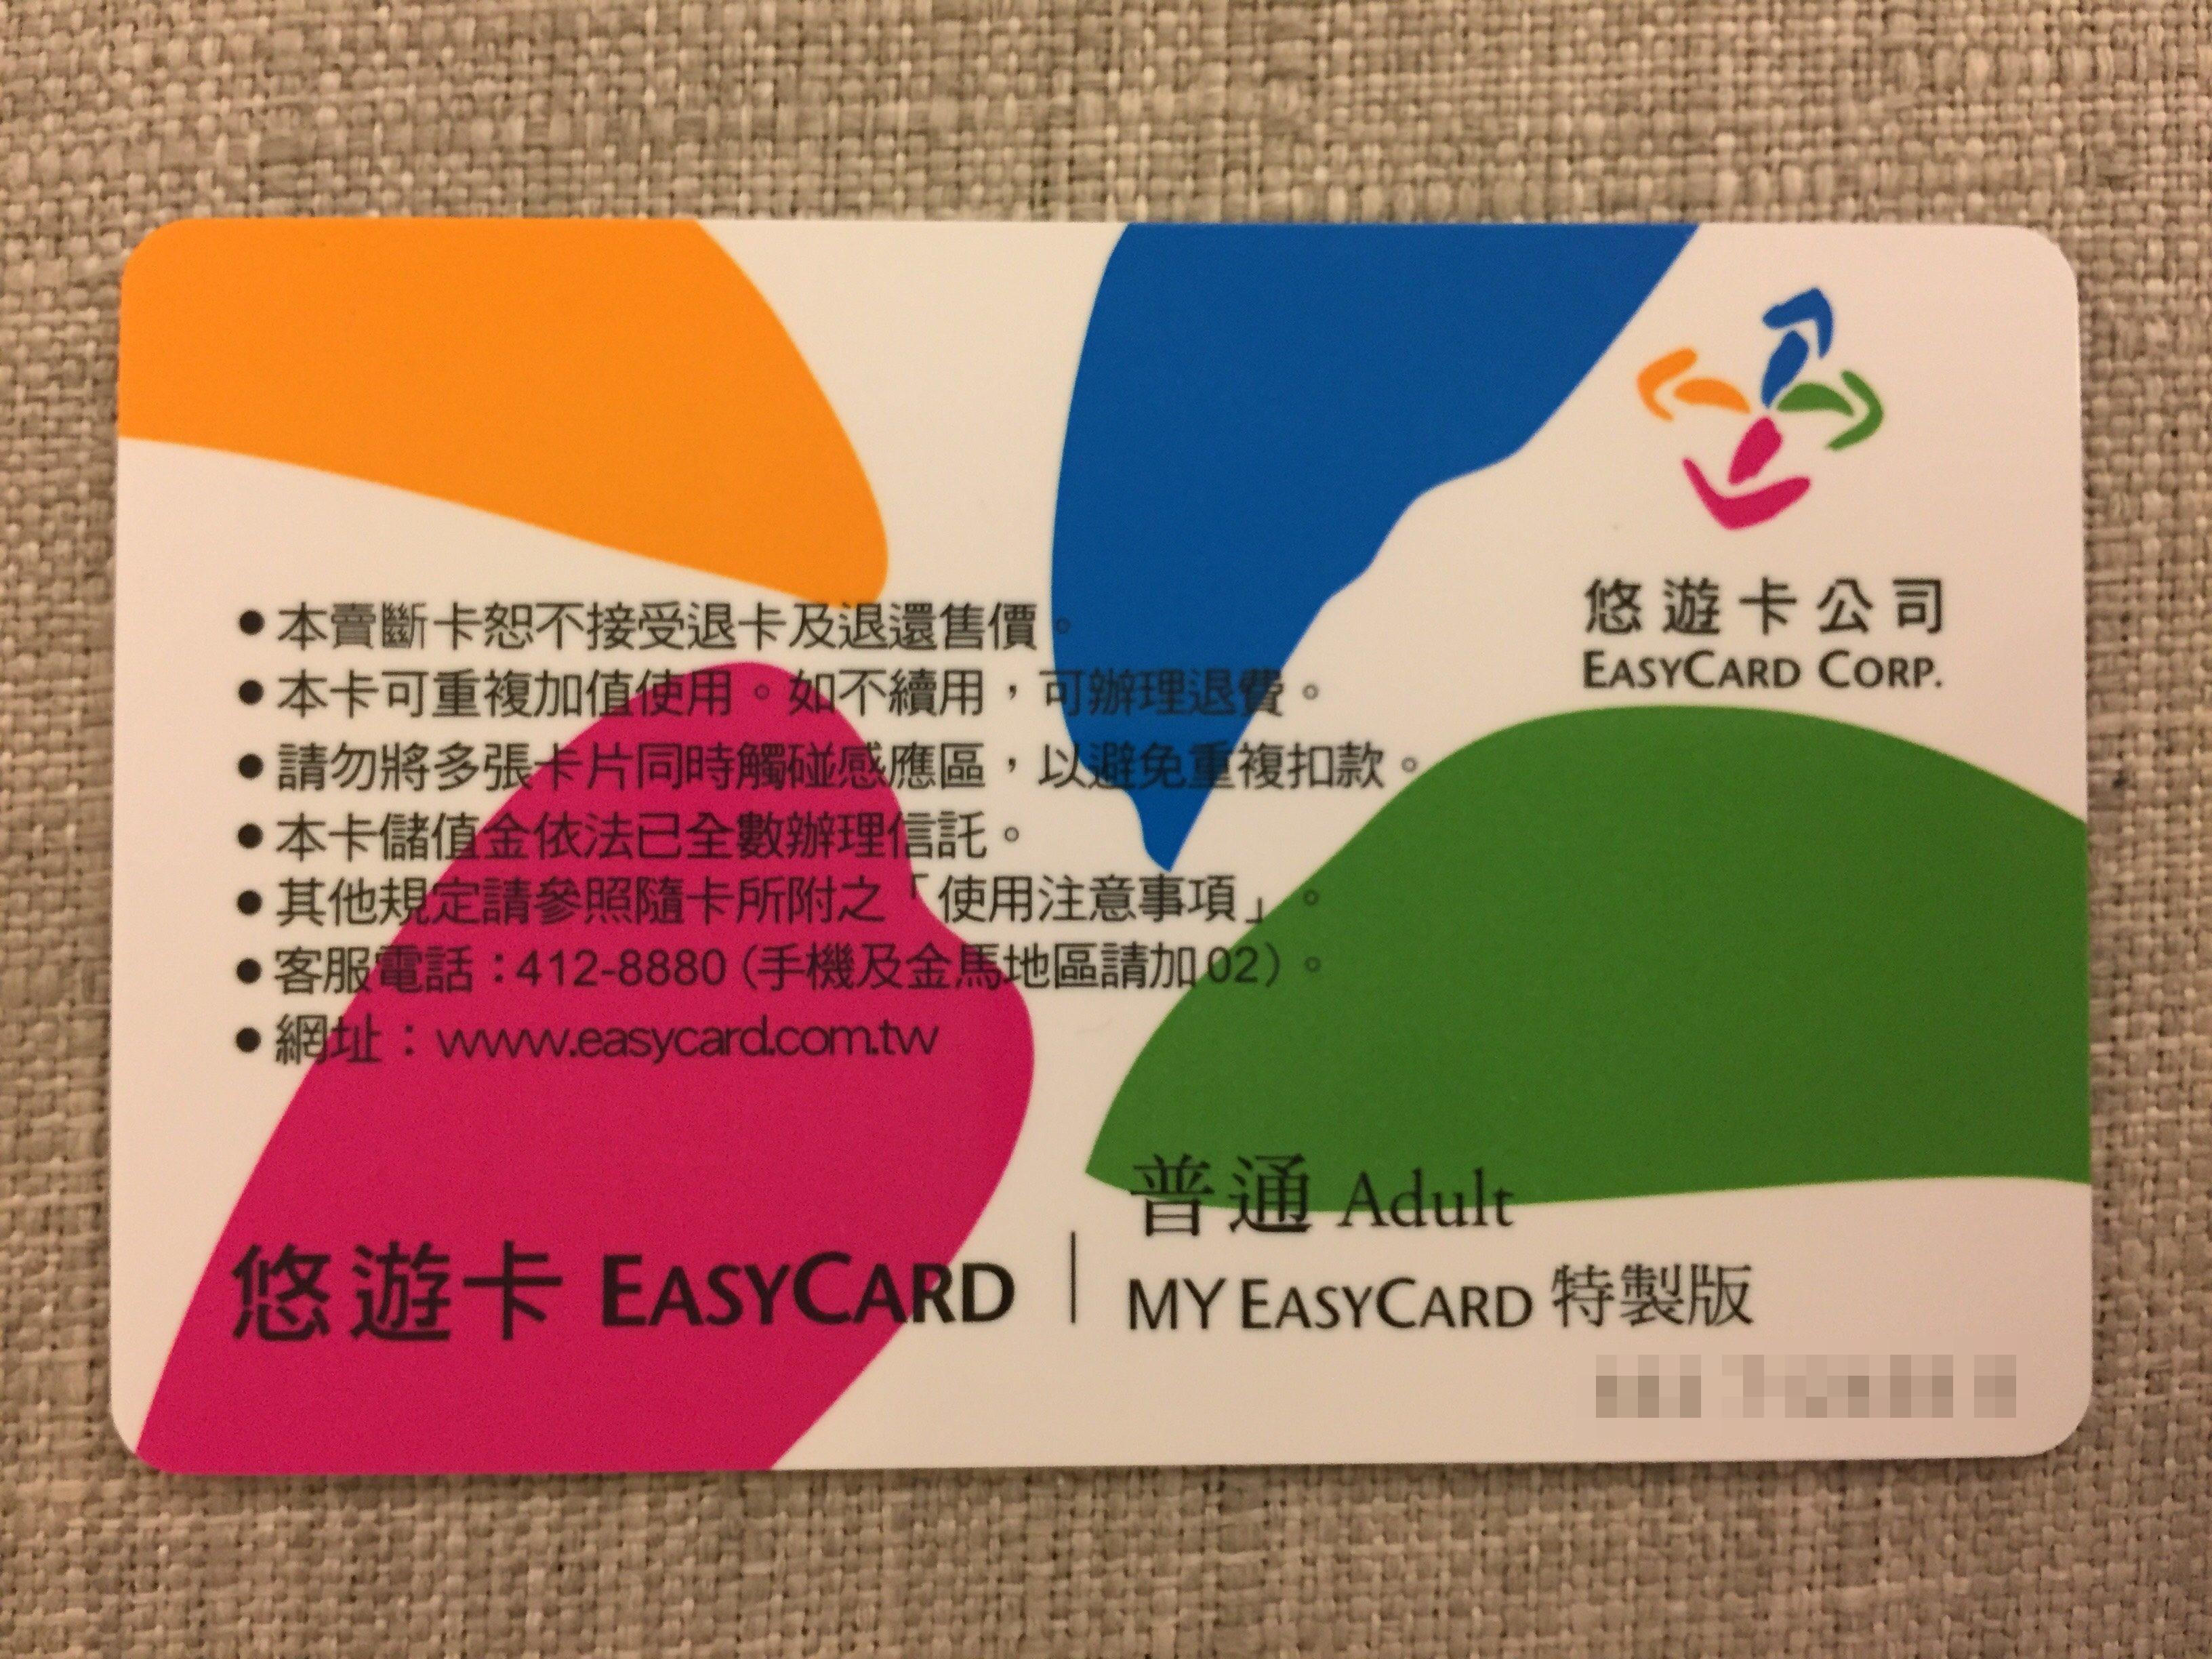 easycard 悠遊カード